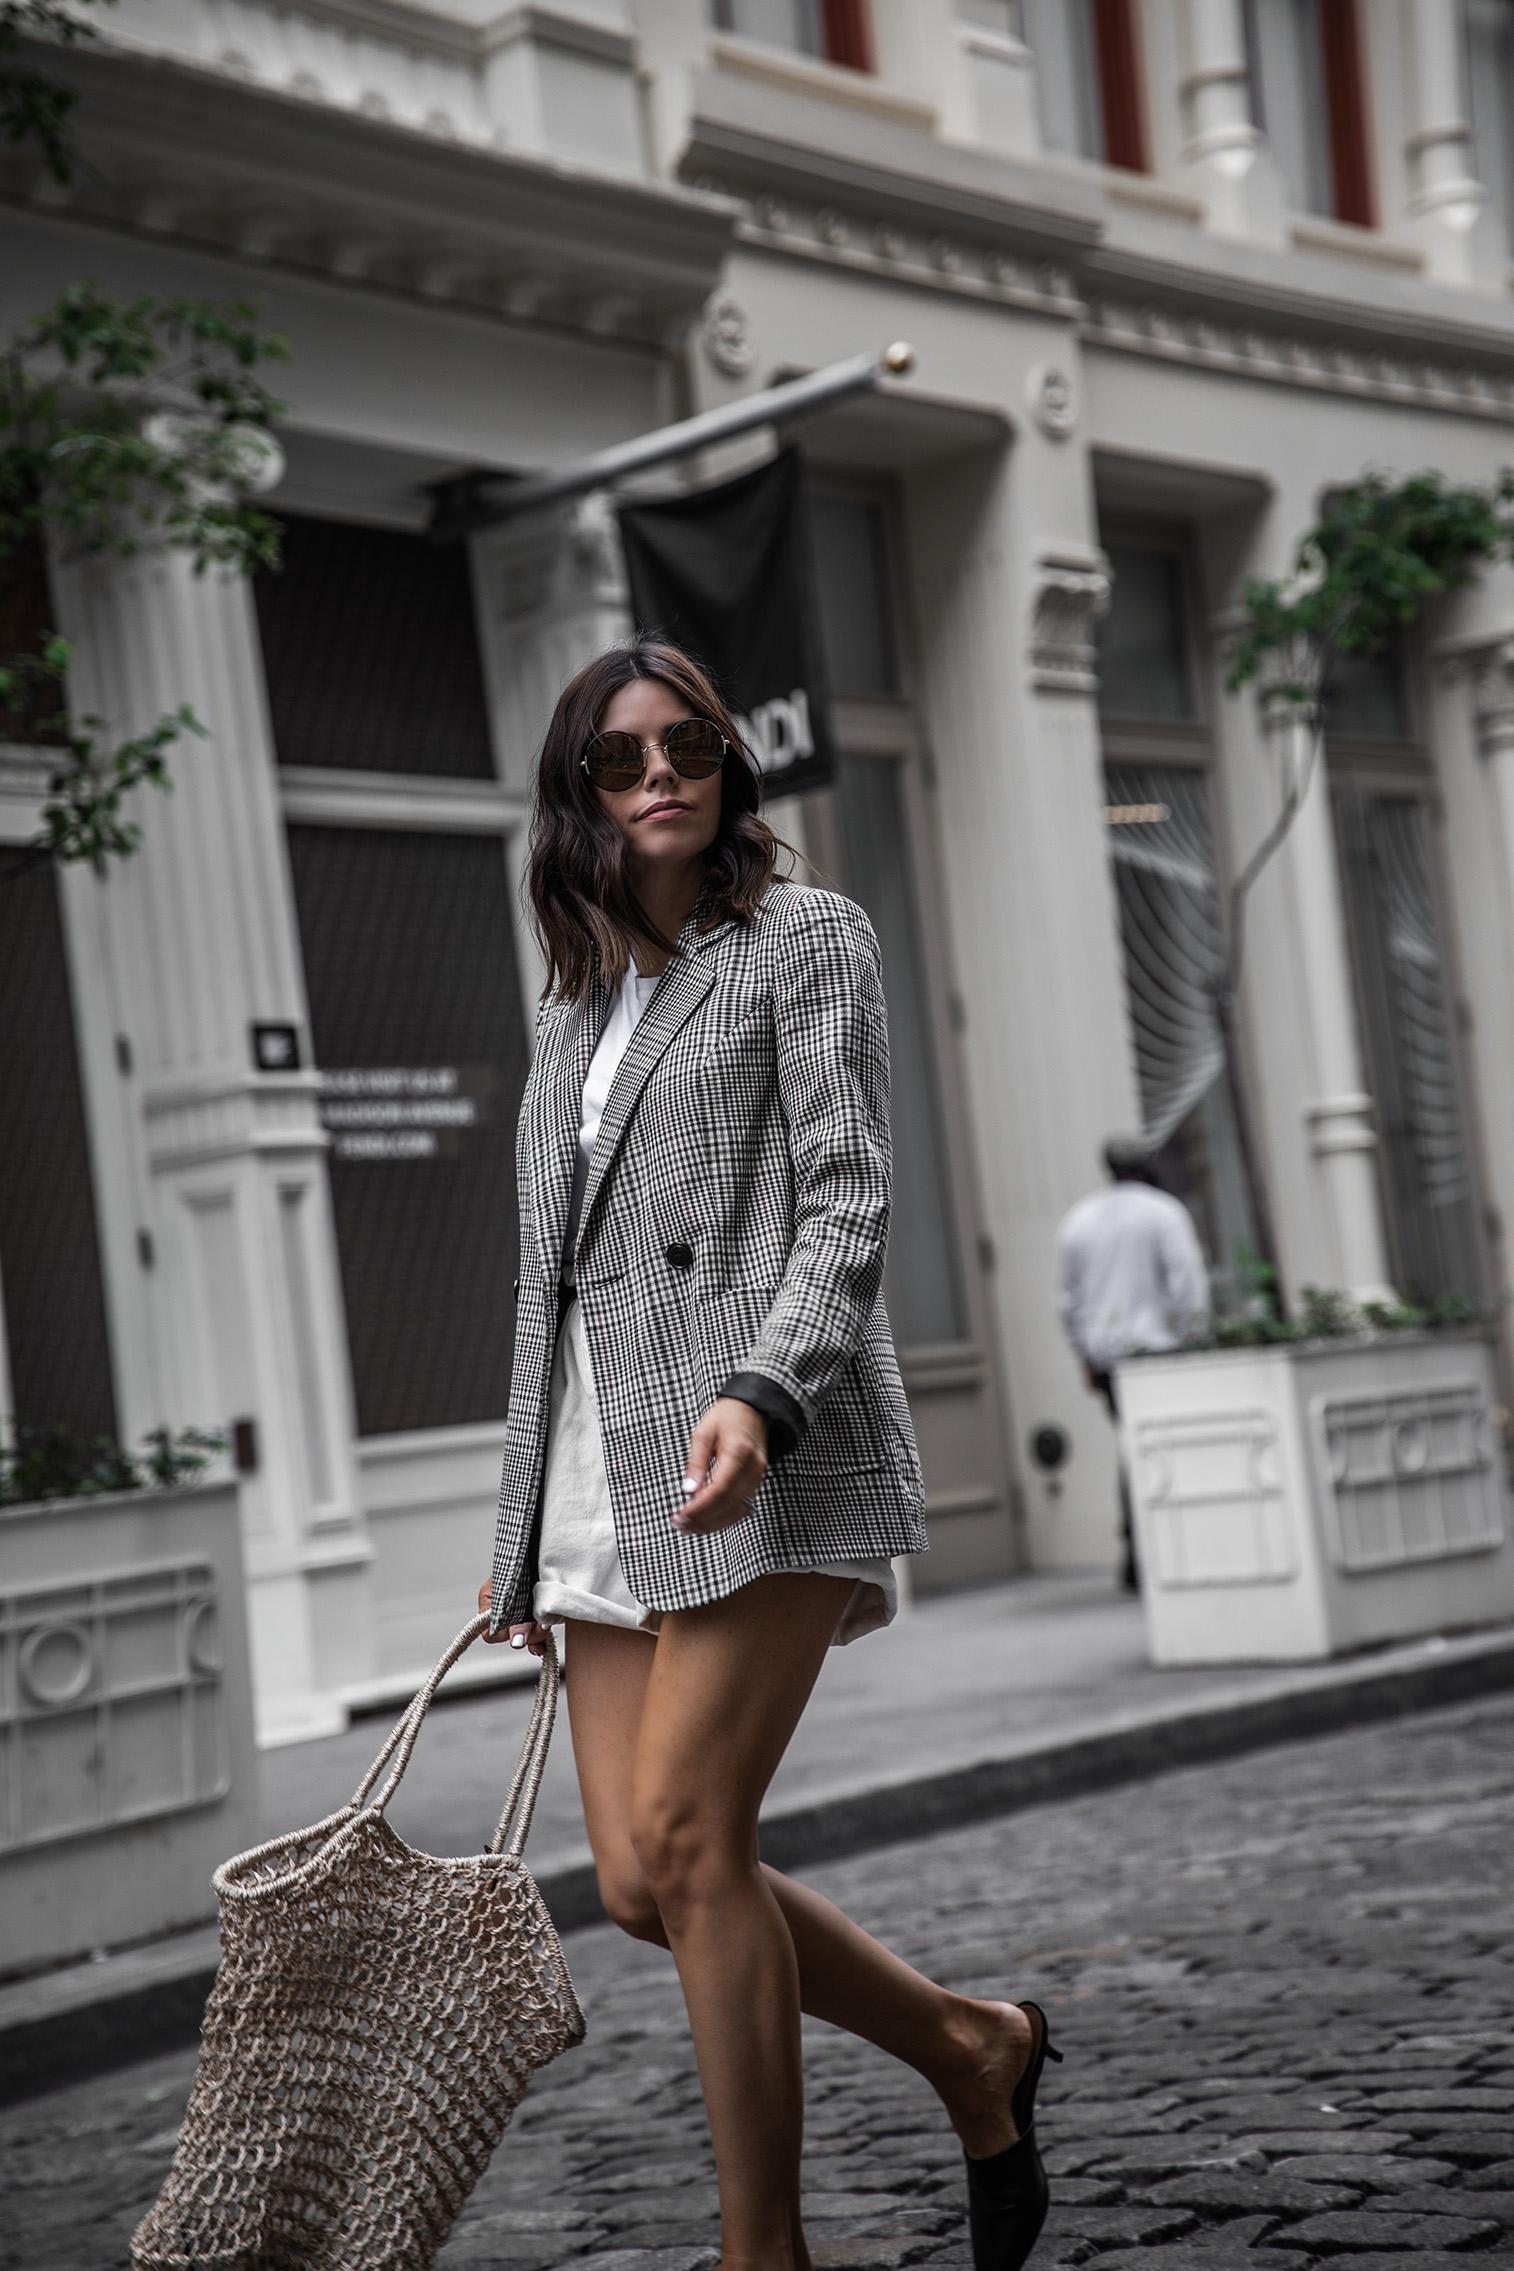 Paper Bag Shorts Trend | Plaid Blazer| White Paper Bag Denim Shorts |Mule Slide (similar) | Knit Bag (similar)